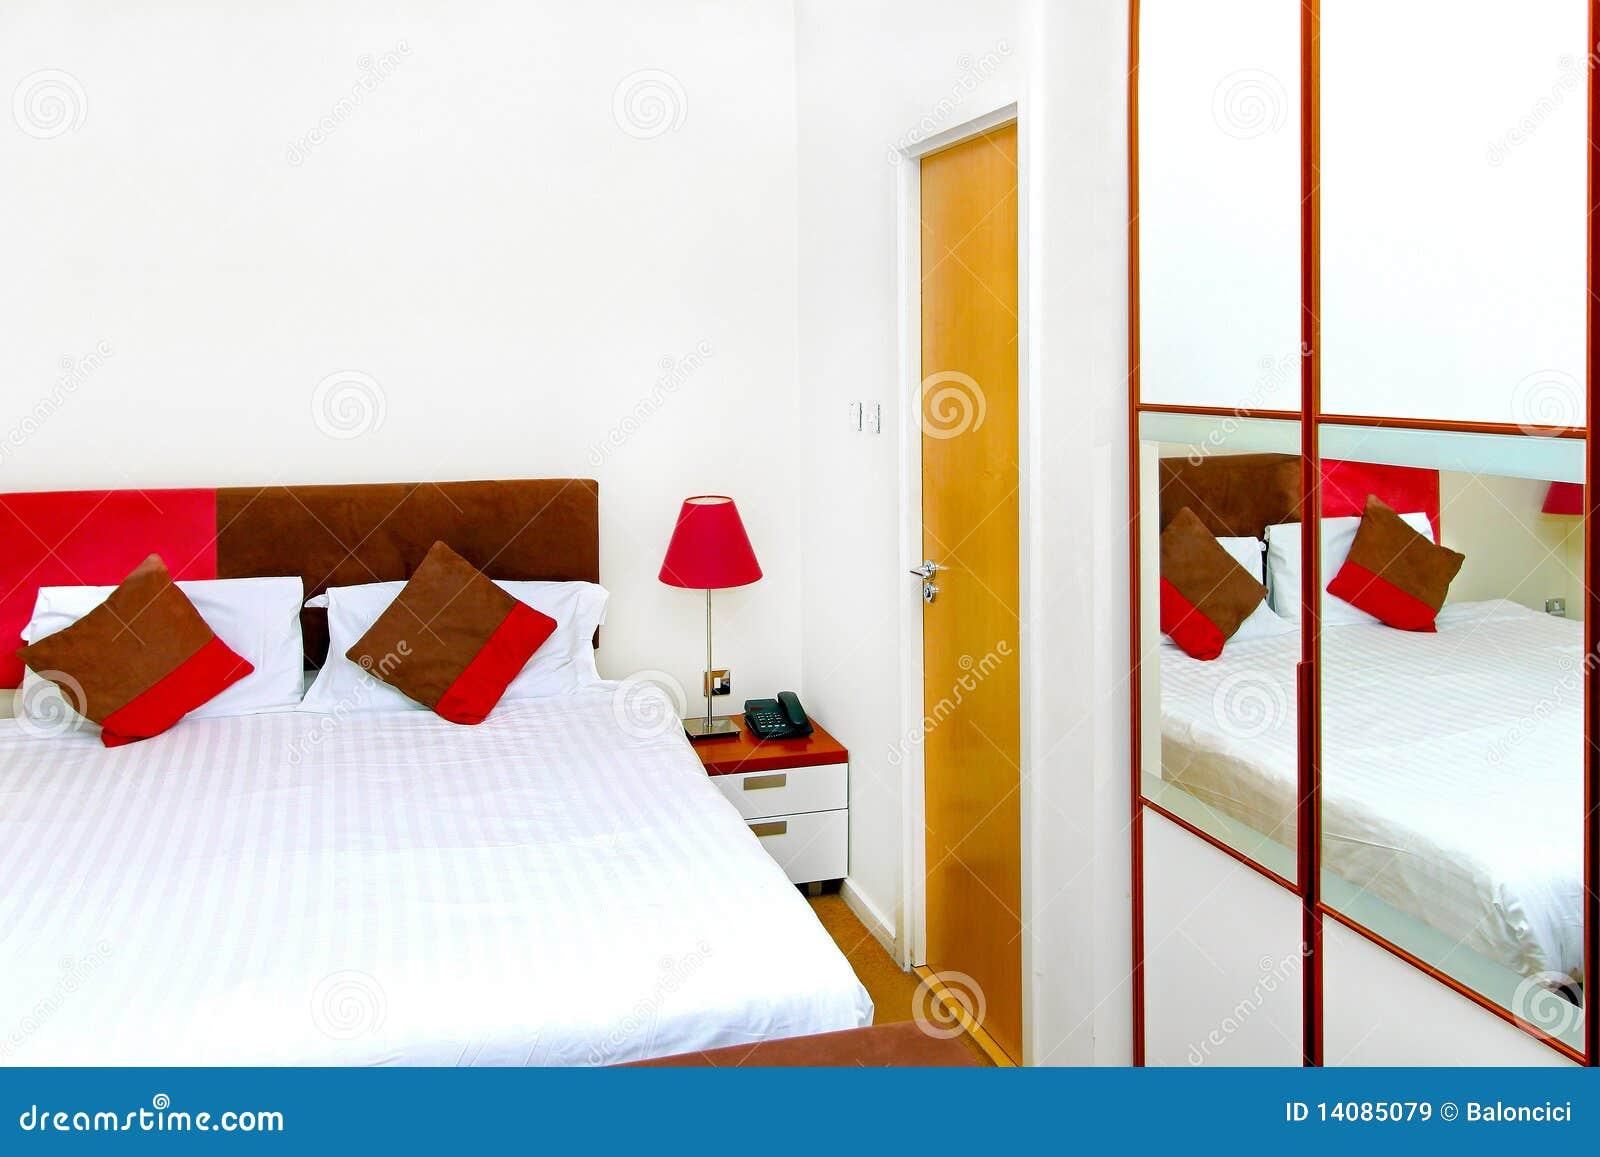 Moderne slaapkamer moderne rijke slaapkamer royalty vrije stock foto moderne slaapkamer - Volwassen slaapkamer lay outs idee ...